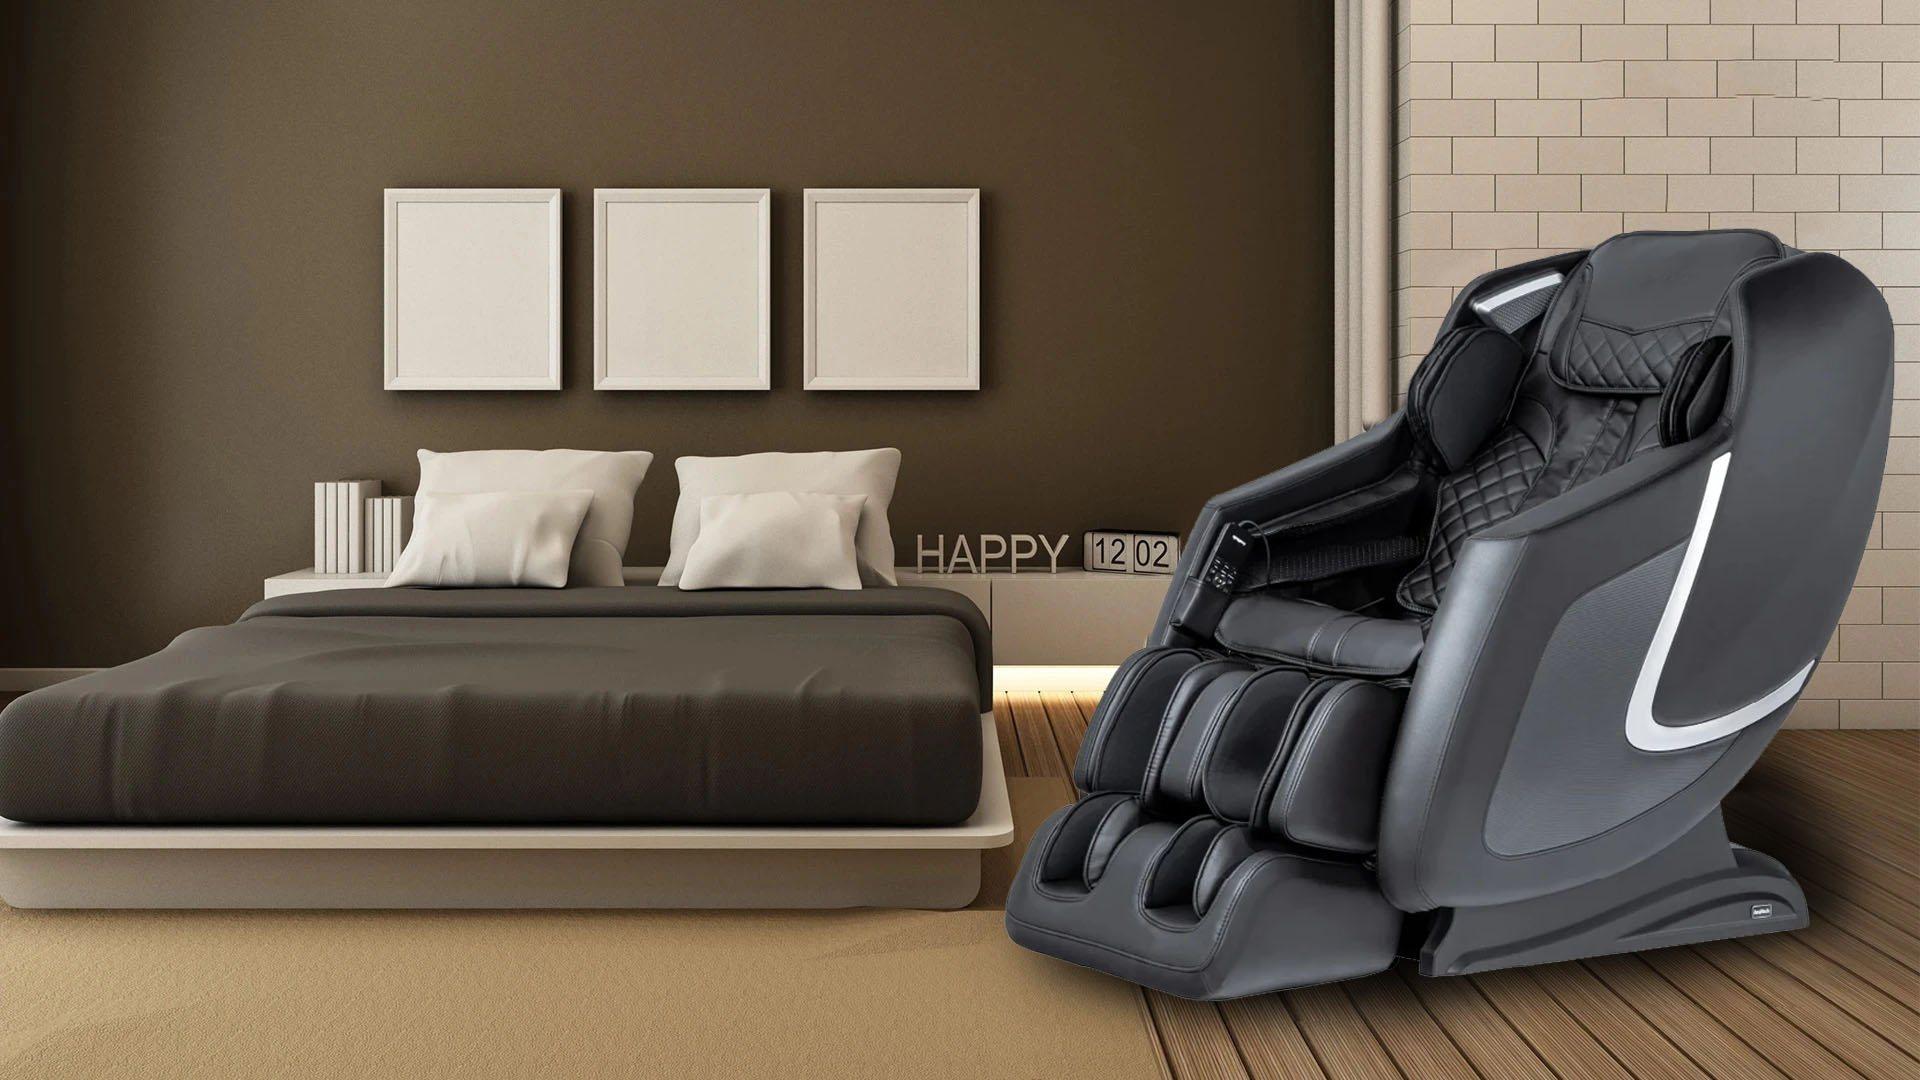 Titan 3D Pro Amamedic Massage Chair